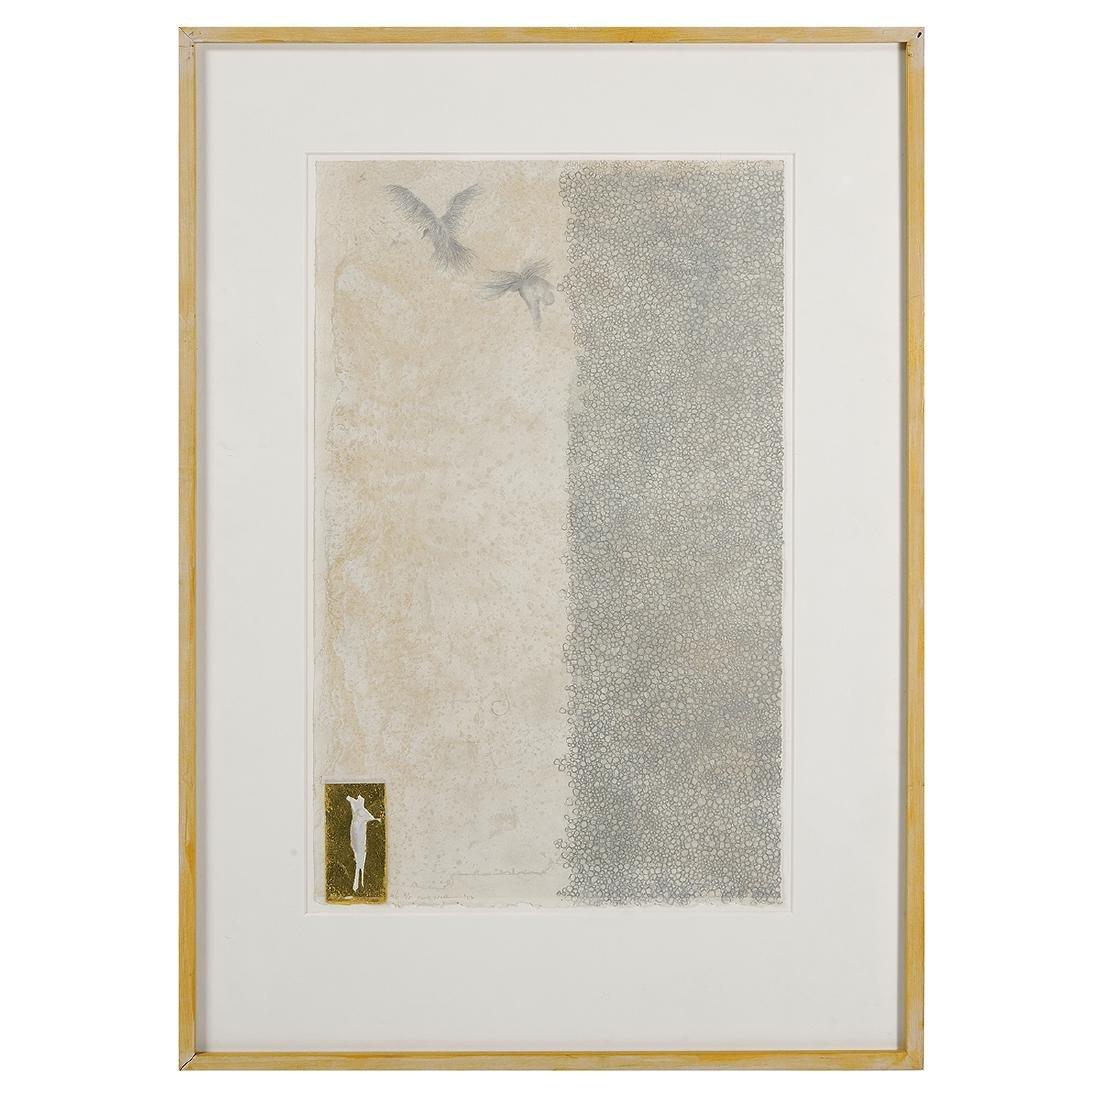 Paul Waldman, Untitled - 10